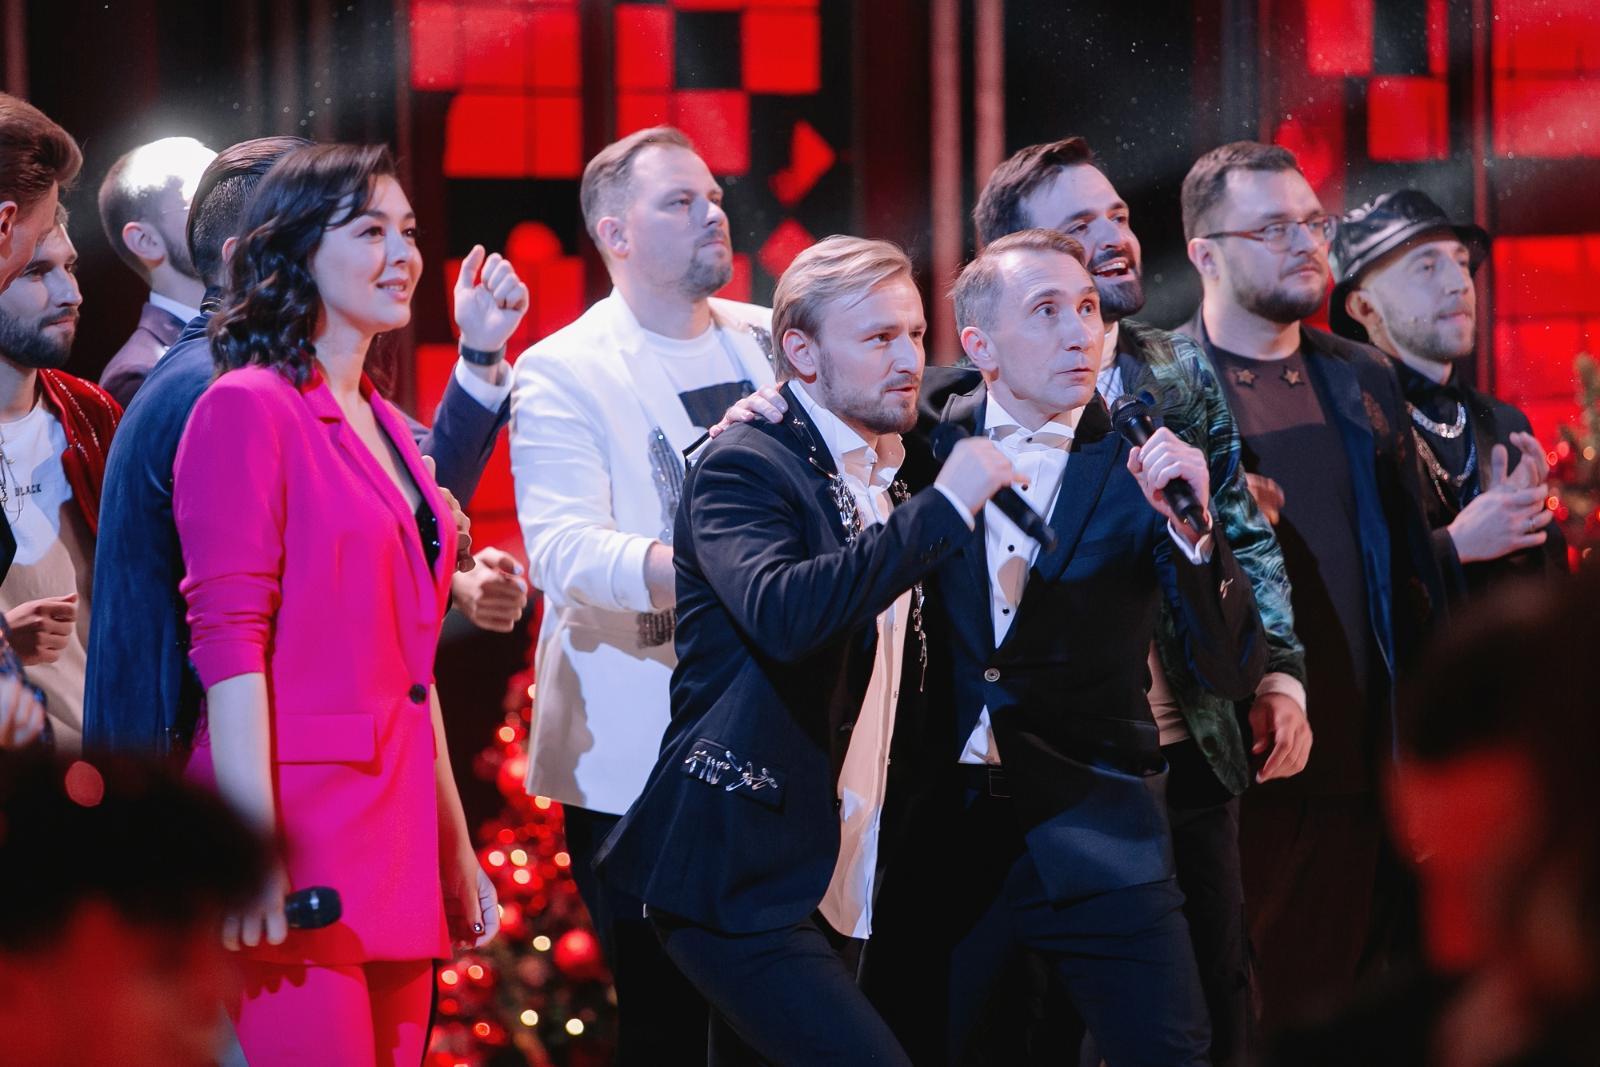 Полина Гагарина, Тимур Родригез, Niletto, Джиган, Алена Водонаева и многие другие на вечеринке Comedy Club